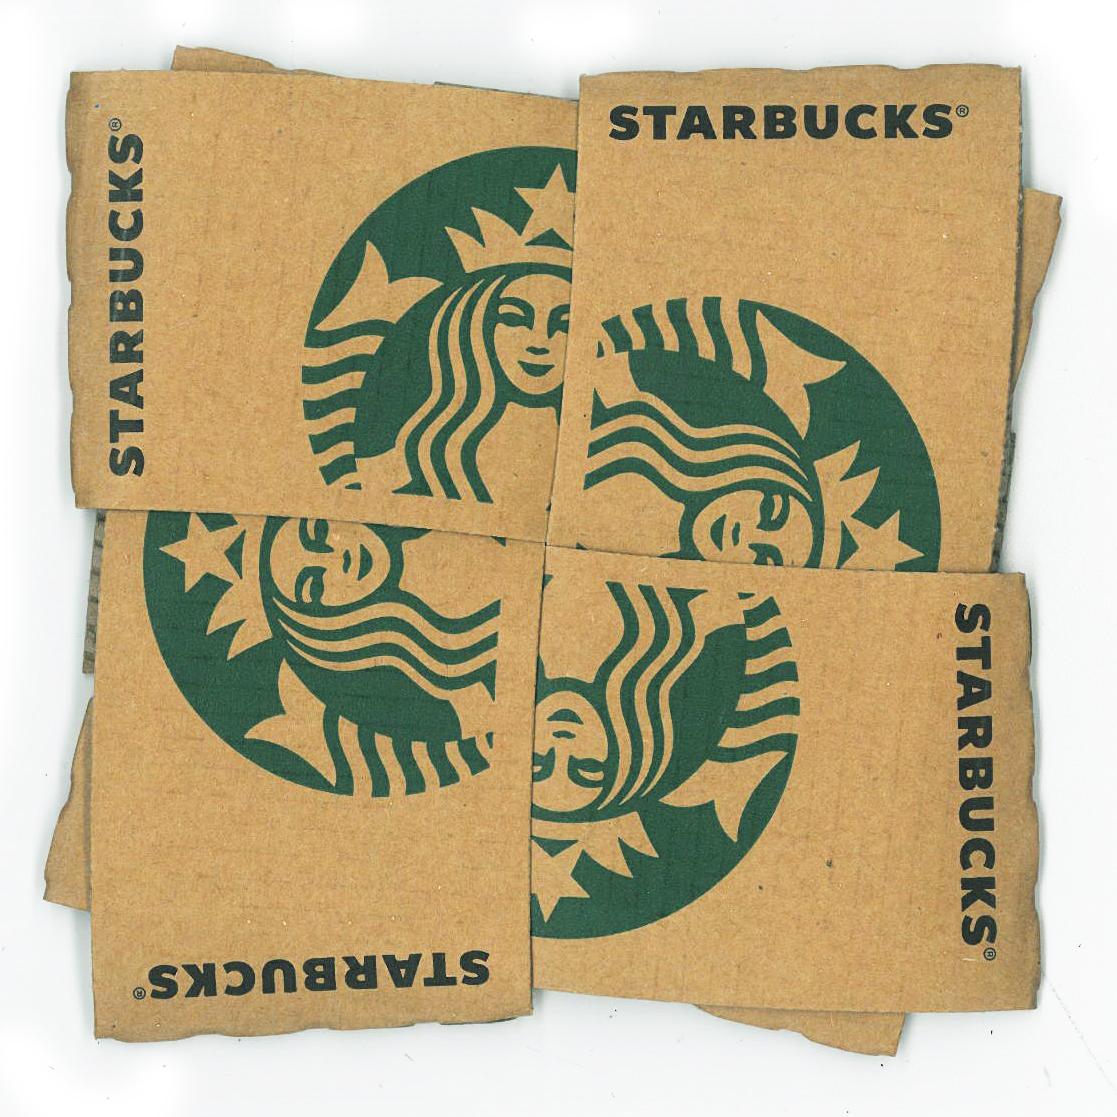 Starbucks Pot Stand